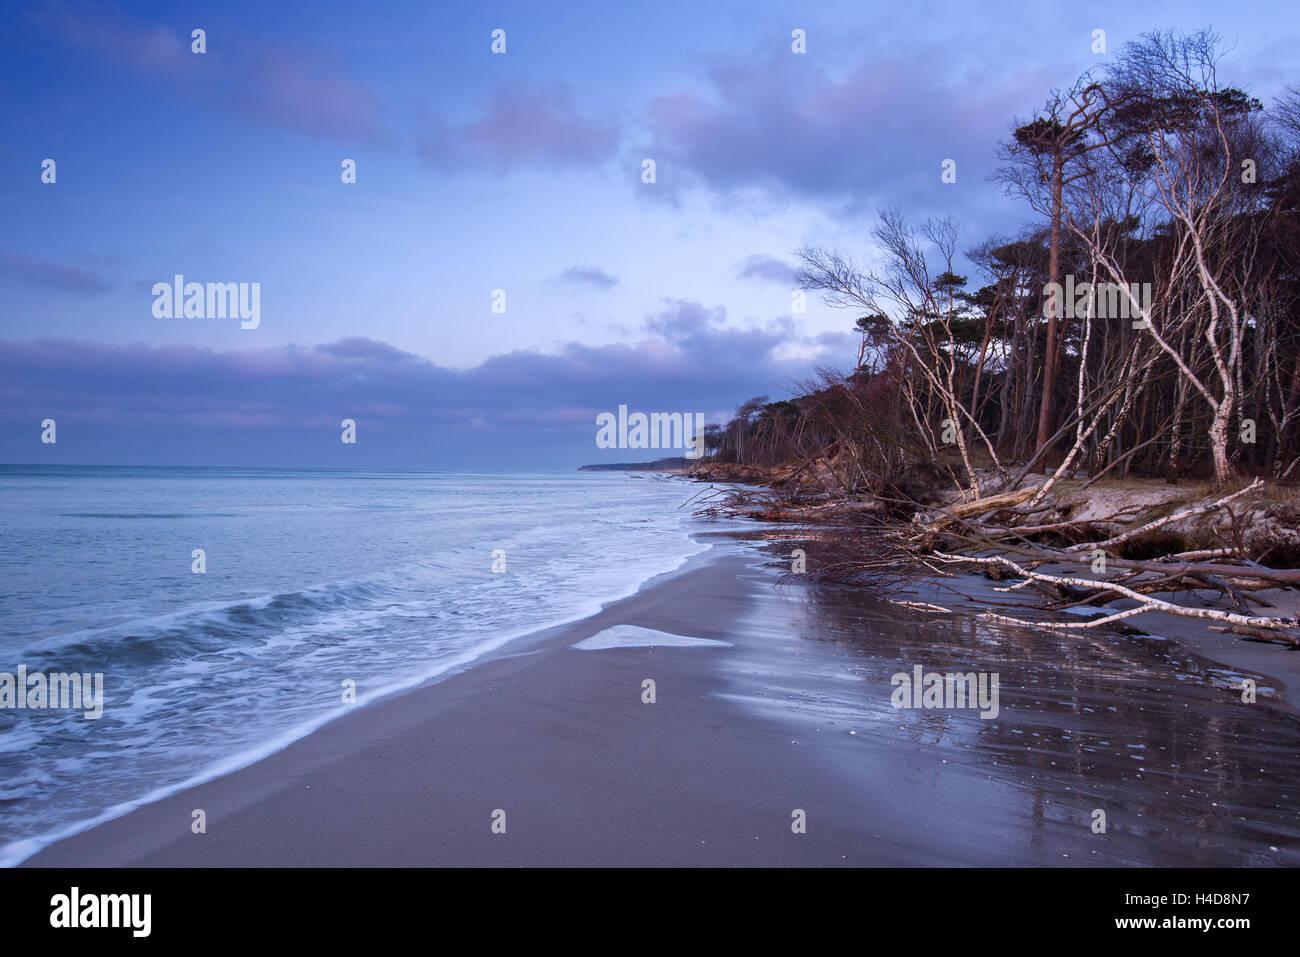 West beach, blue hour, coast, the Baltic Sea, Mecklenburg-West Pomerania, Germany, Europe - Stock Image